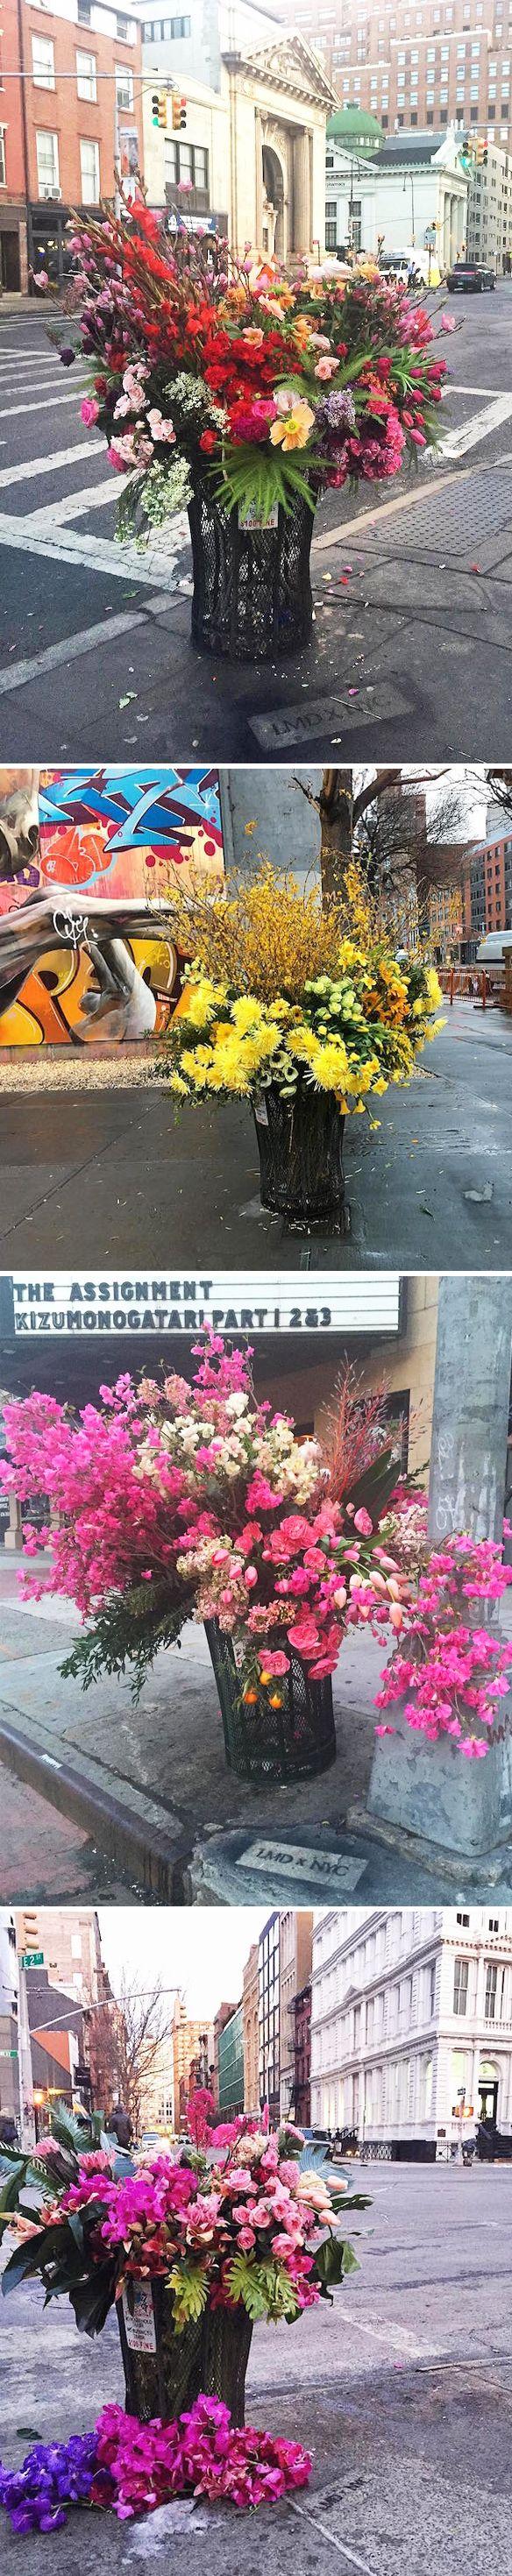 new york's trash cans turned into flower vases! <3 lewis paul miller